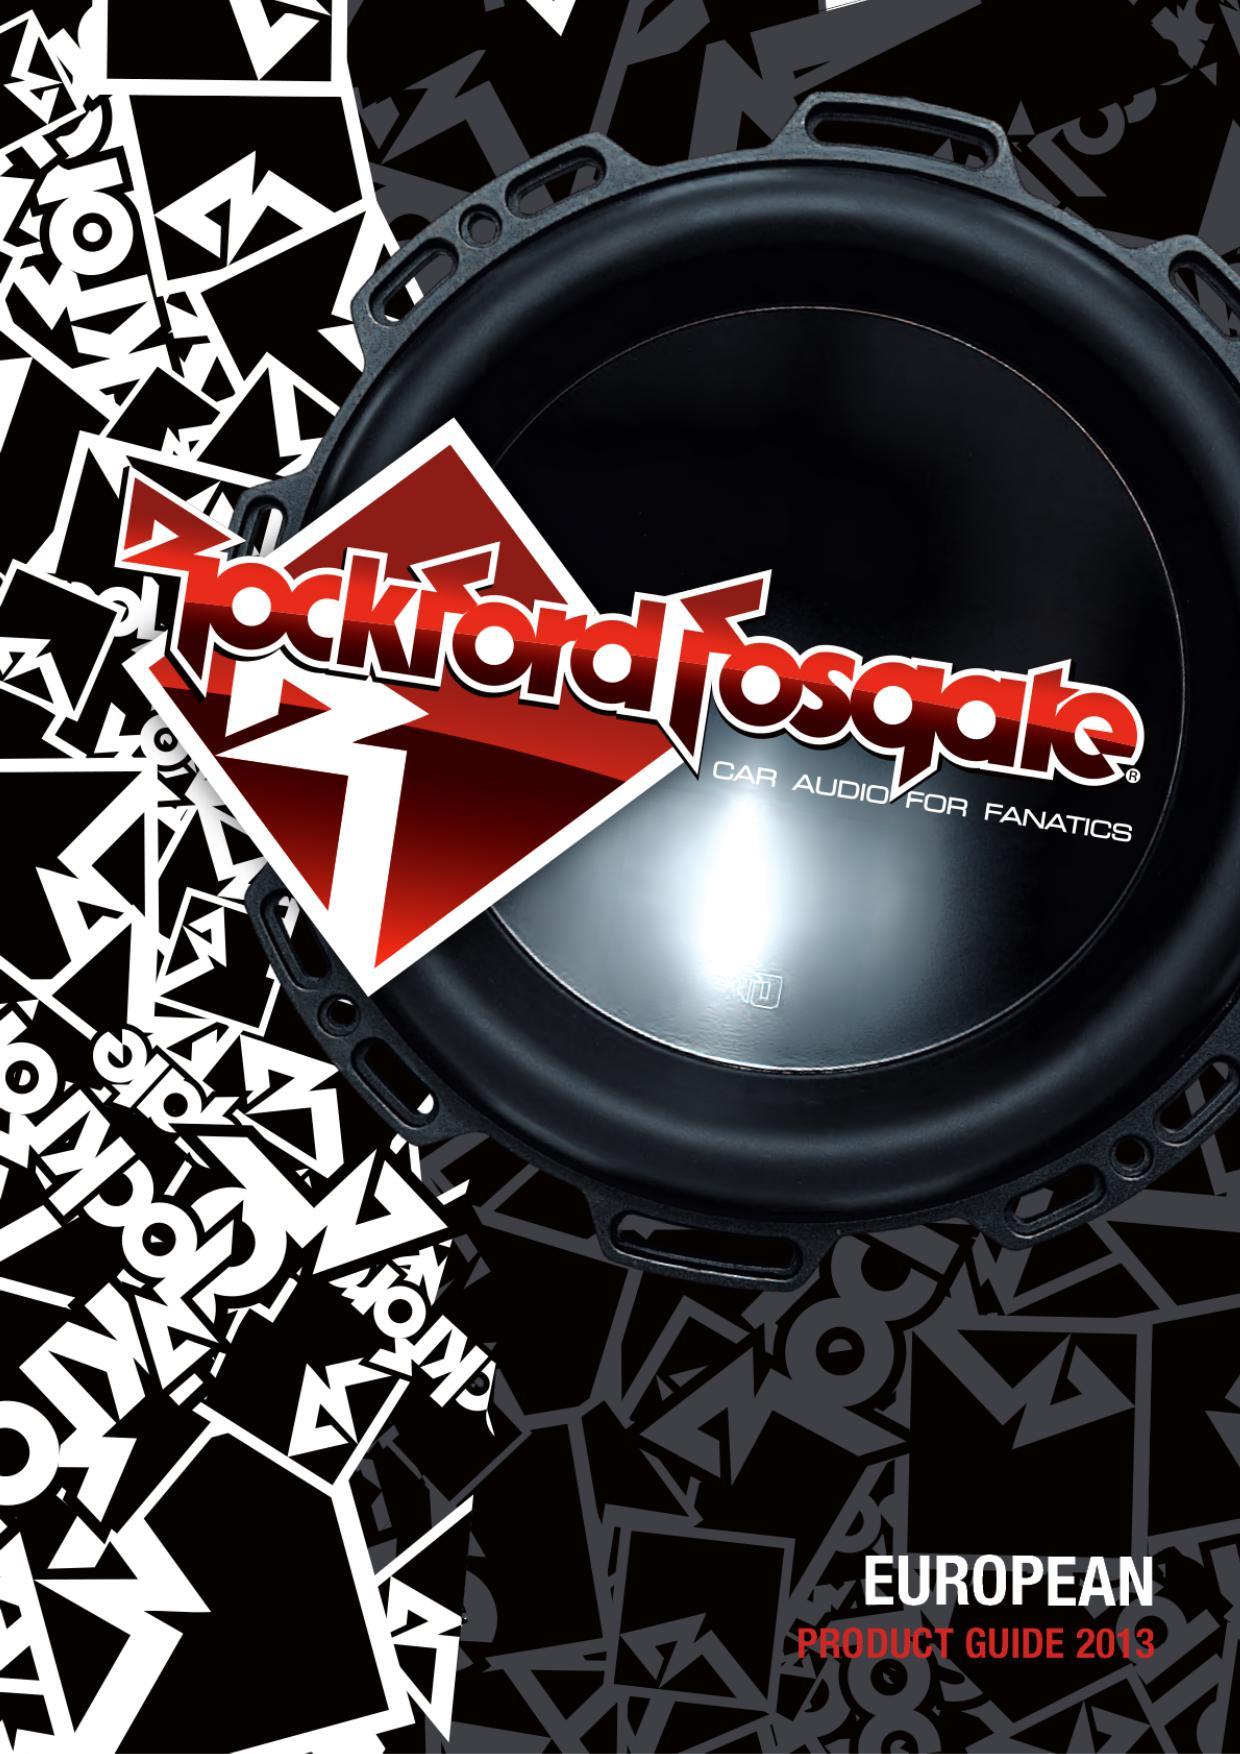 rockford Fosgate  Car Hifi Lautsprecher Katalalog